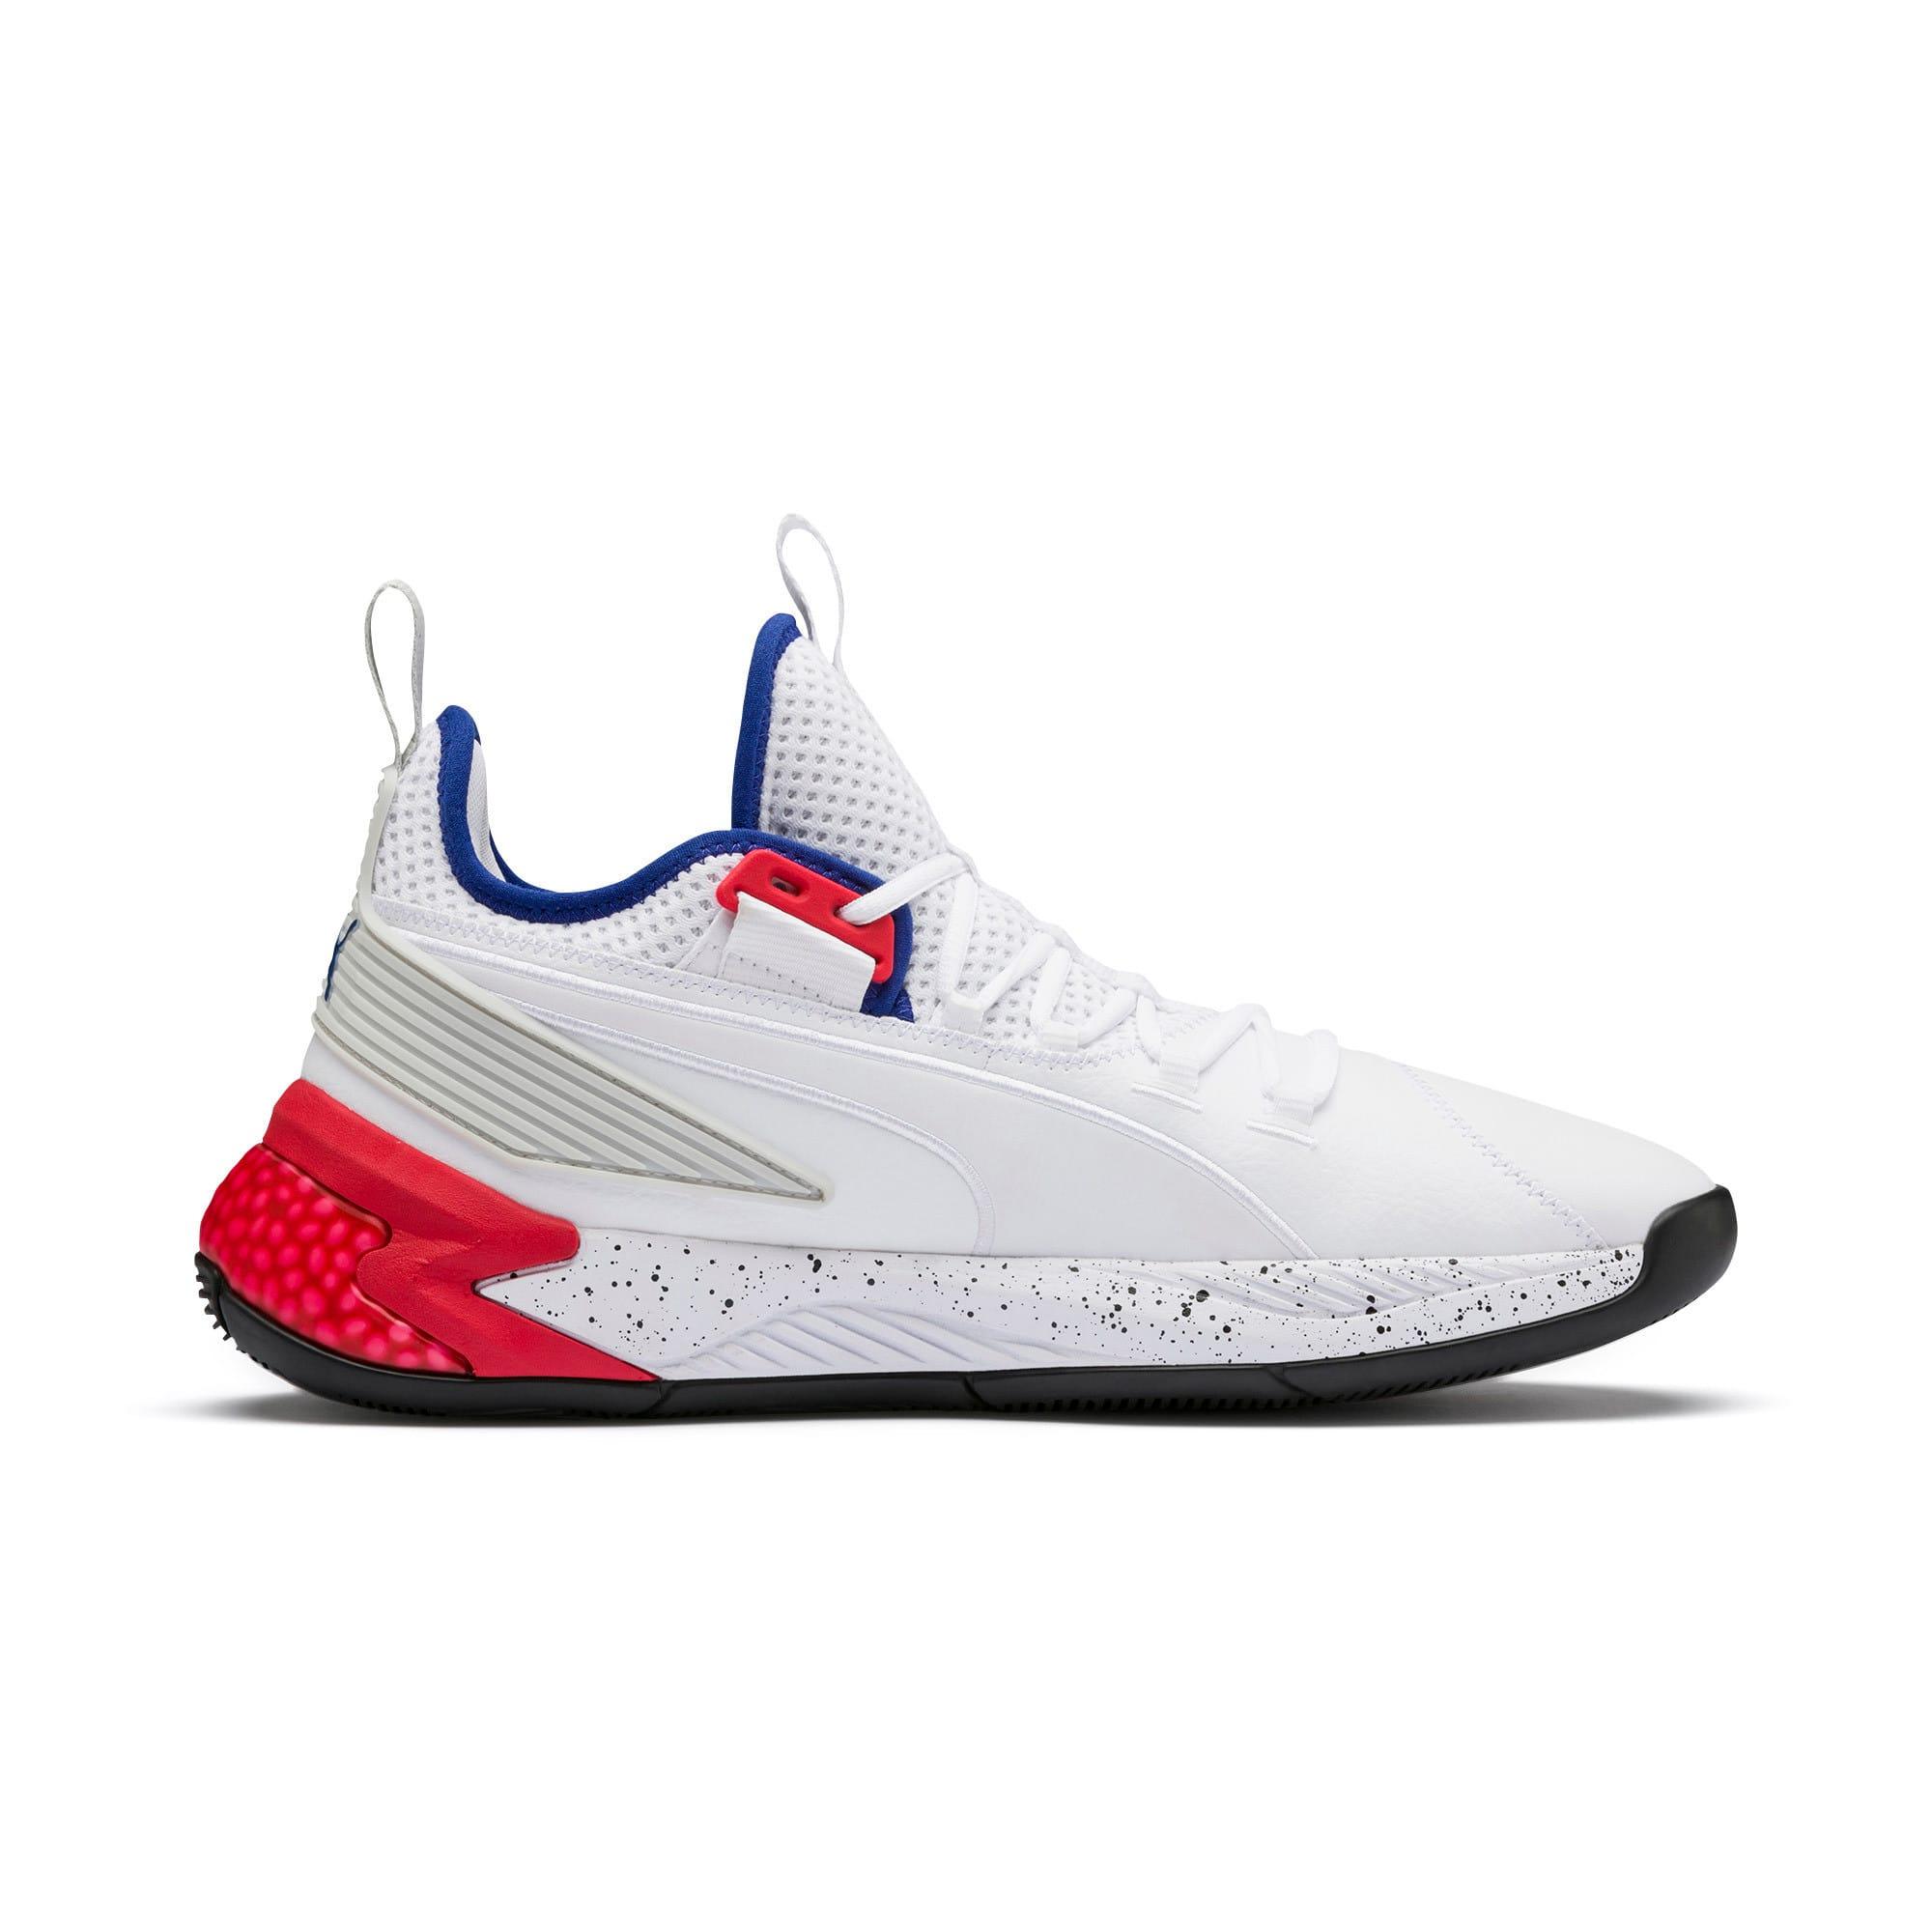 Thumbnail 5 of Uproar Palace Guard Basketball Shoes, Puma White-Surf The Web, medium